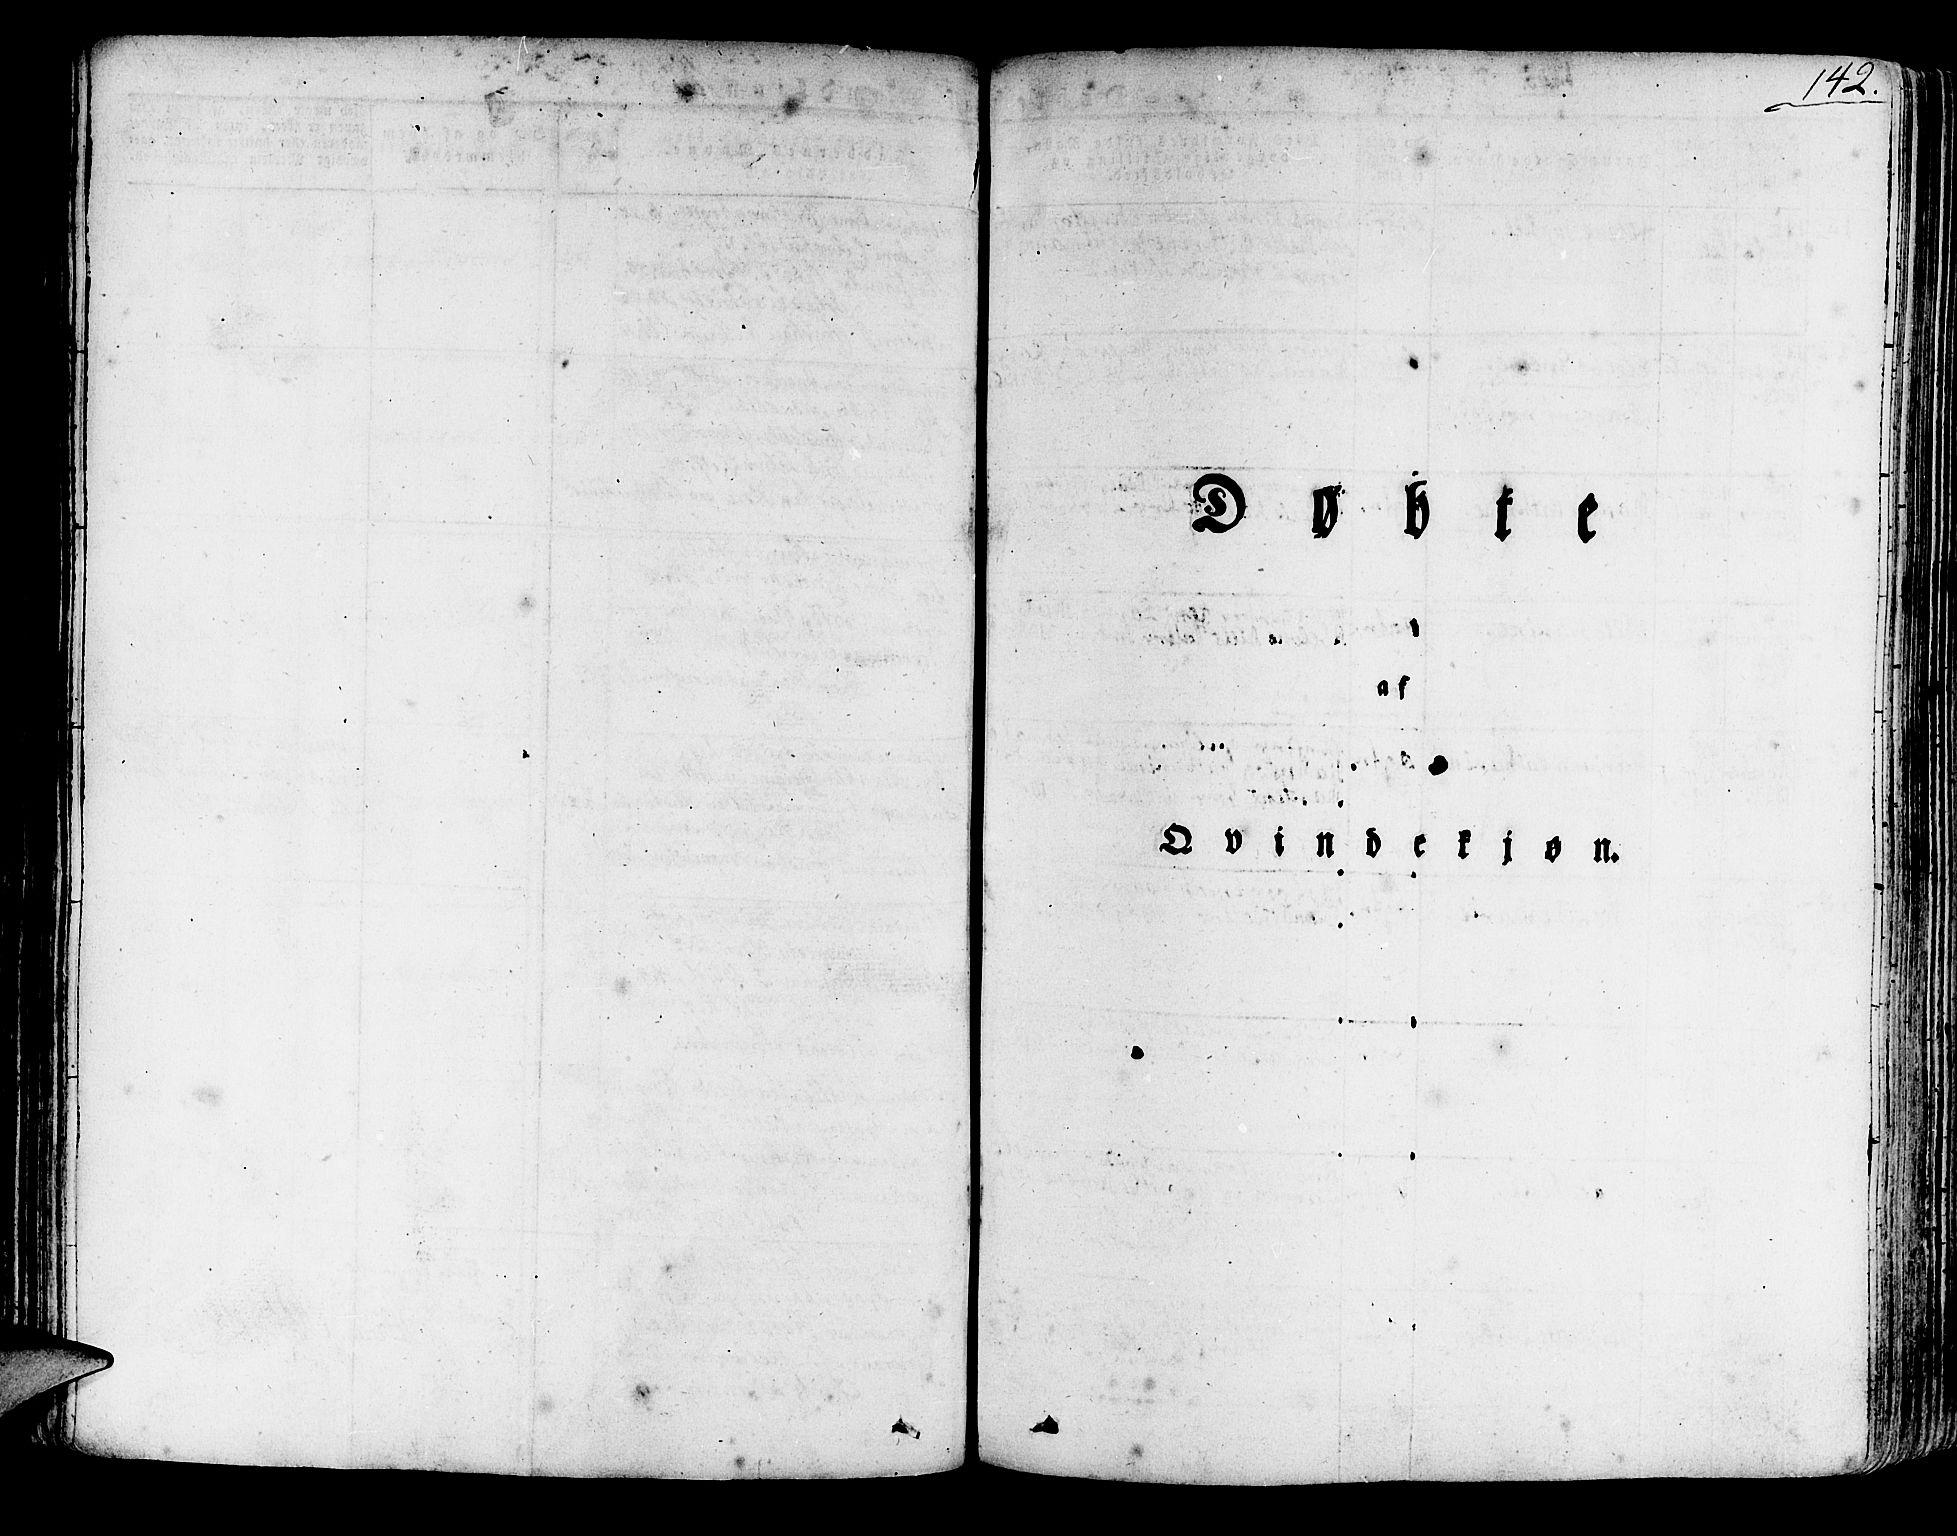 SAB, Korskirken Sokneprestembete, H/Haa/L0014: Ministerialbok nr. A 14, 1823-1835, s. 142